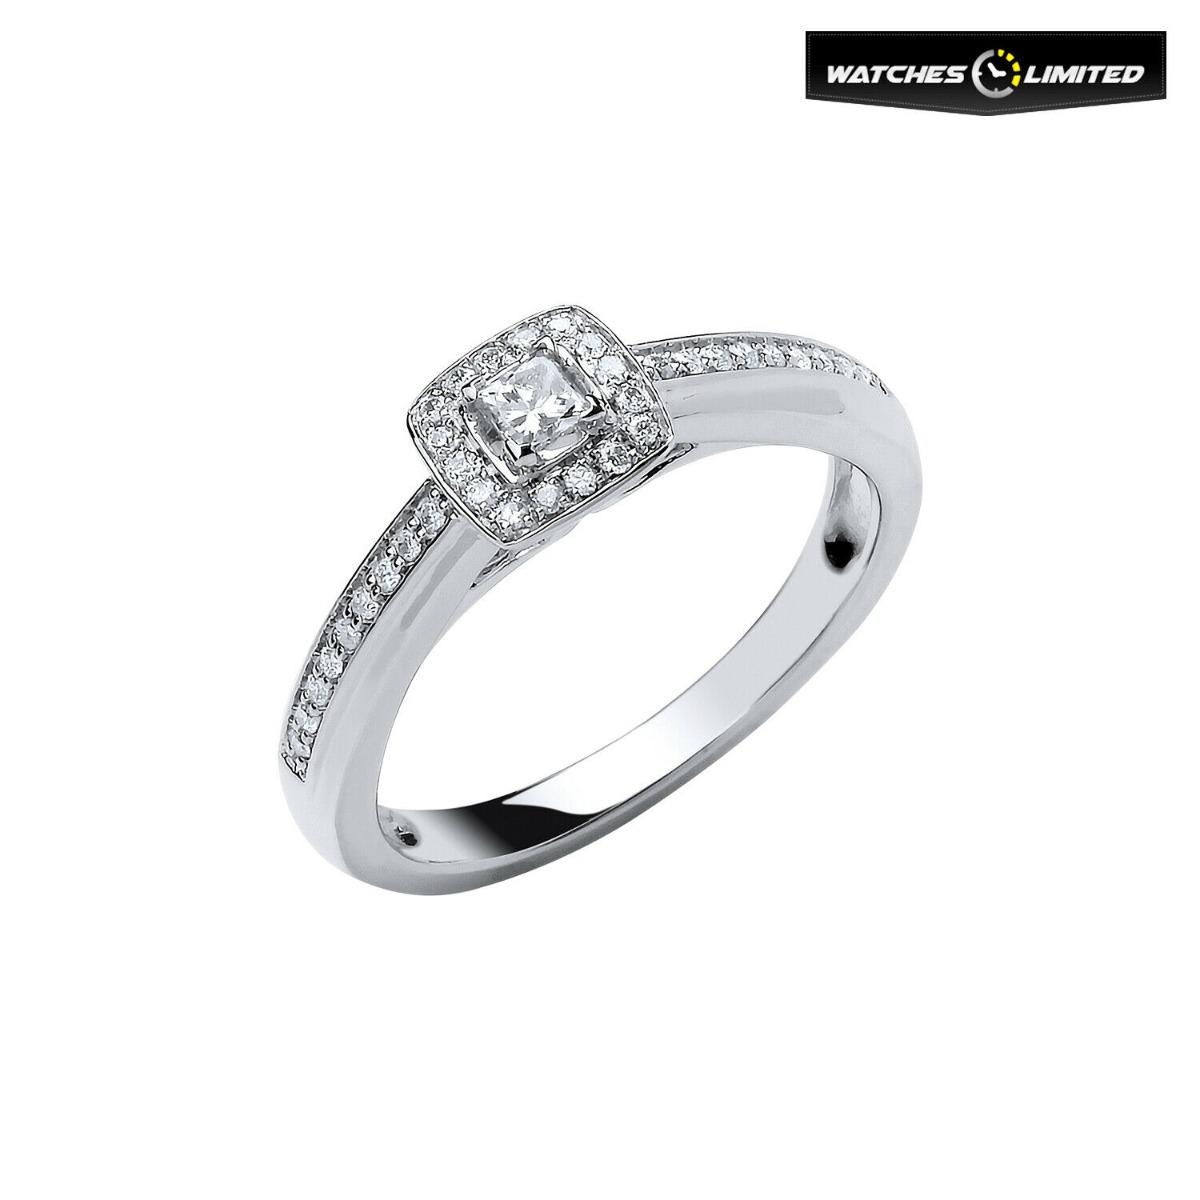 Ladies 18ct White Gold 0.25ct Diamond Engagement Ring Size M